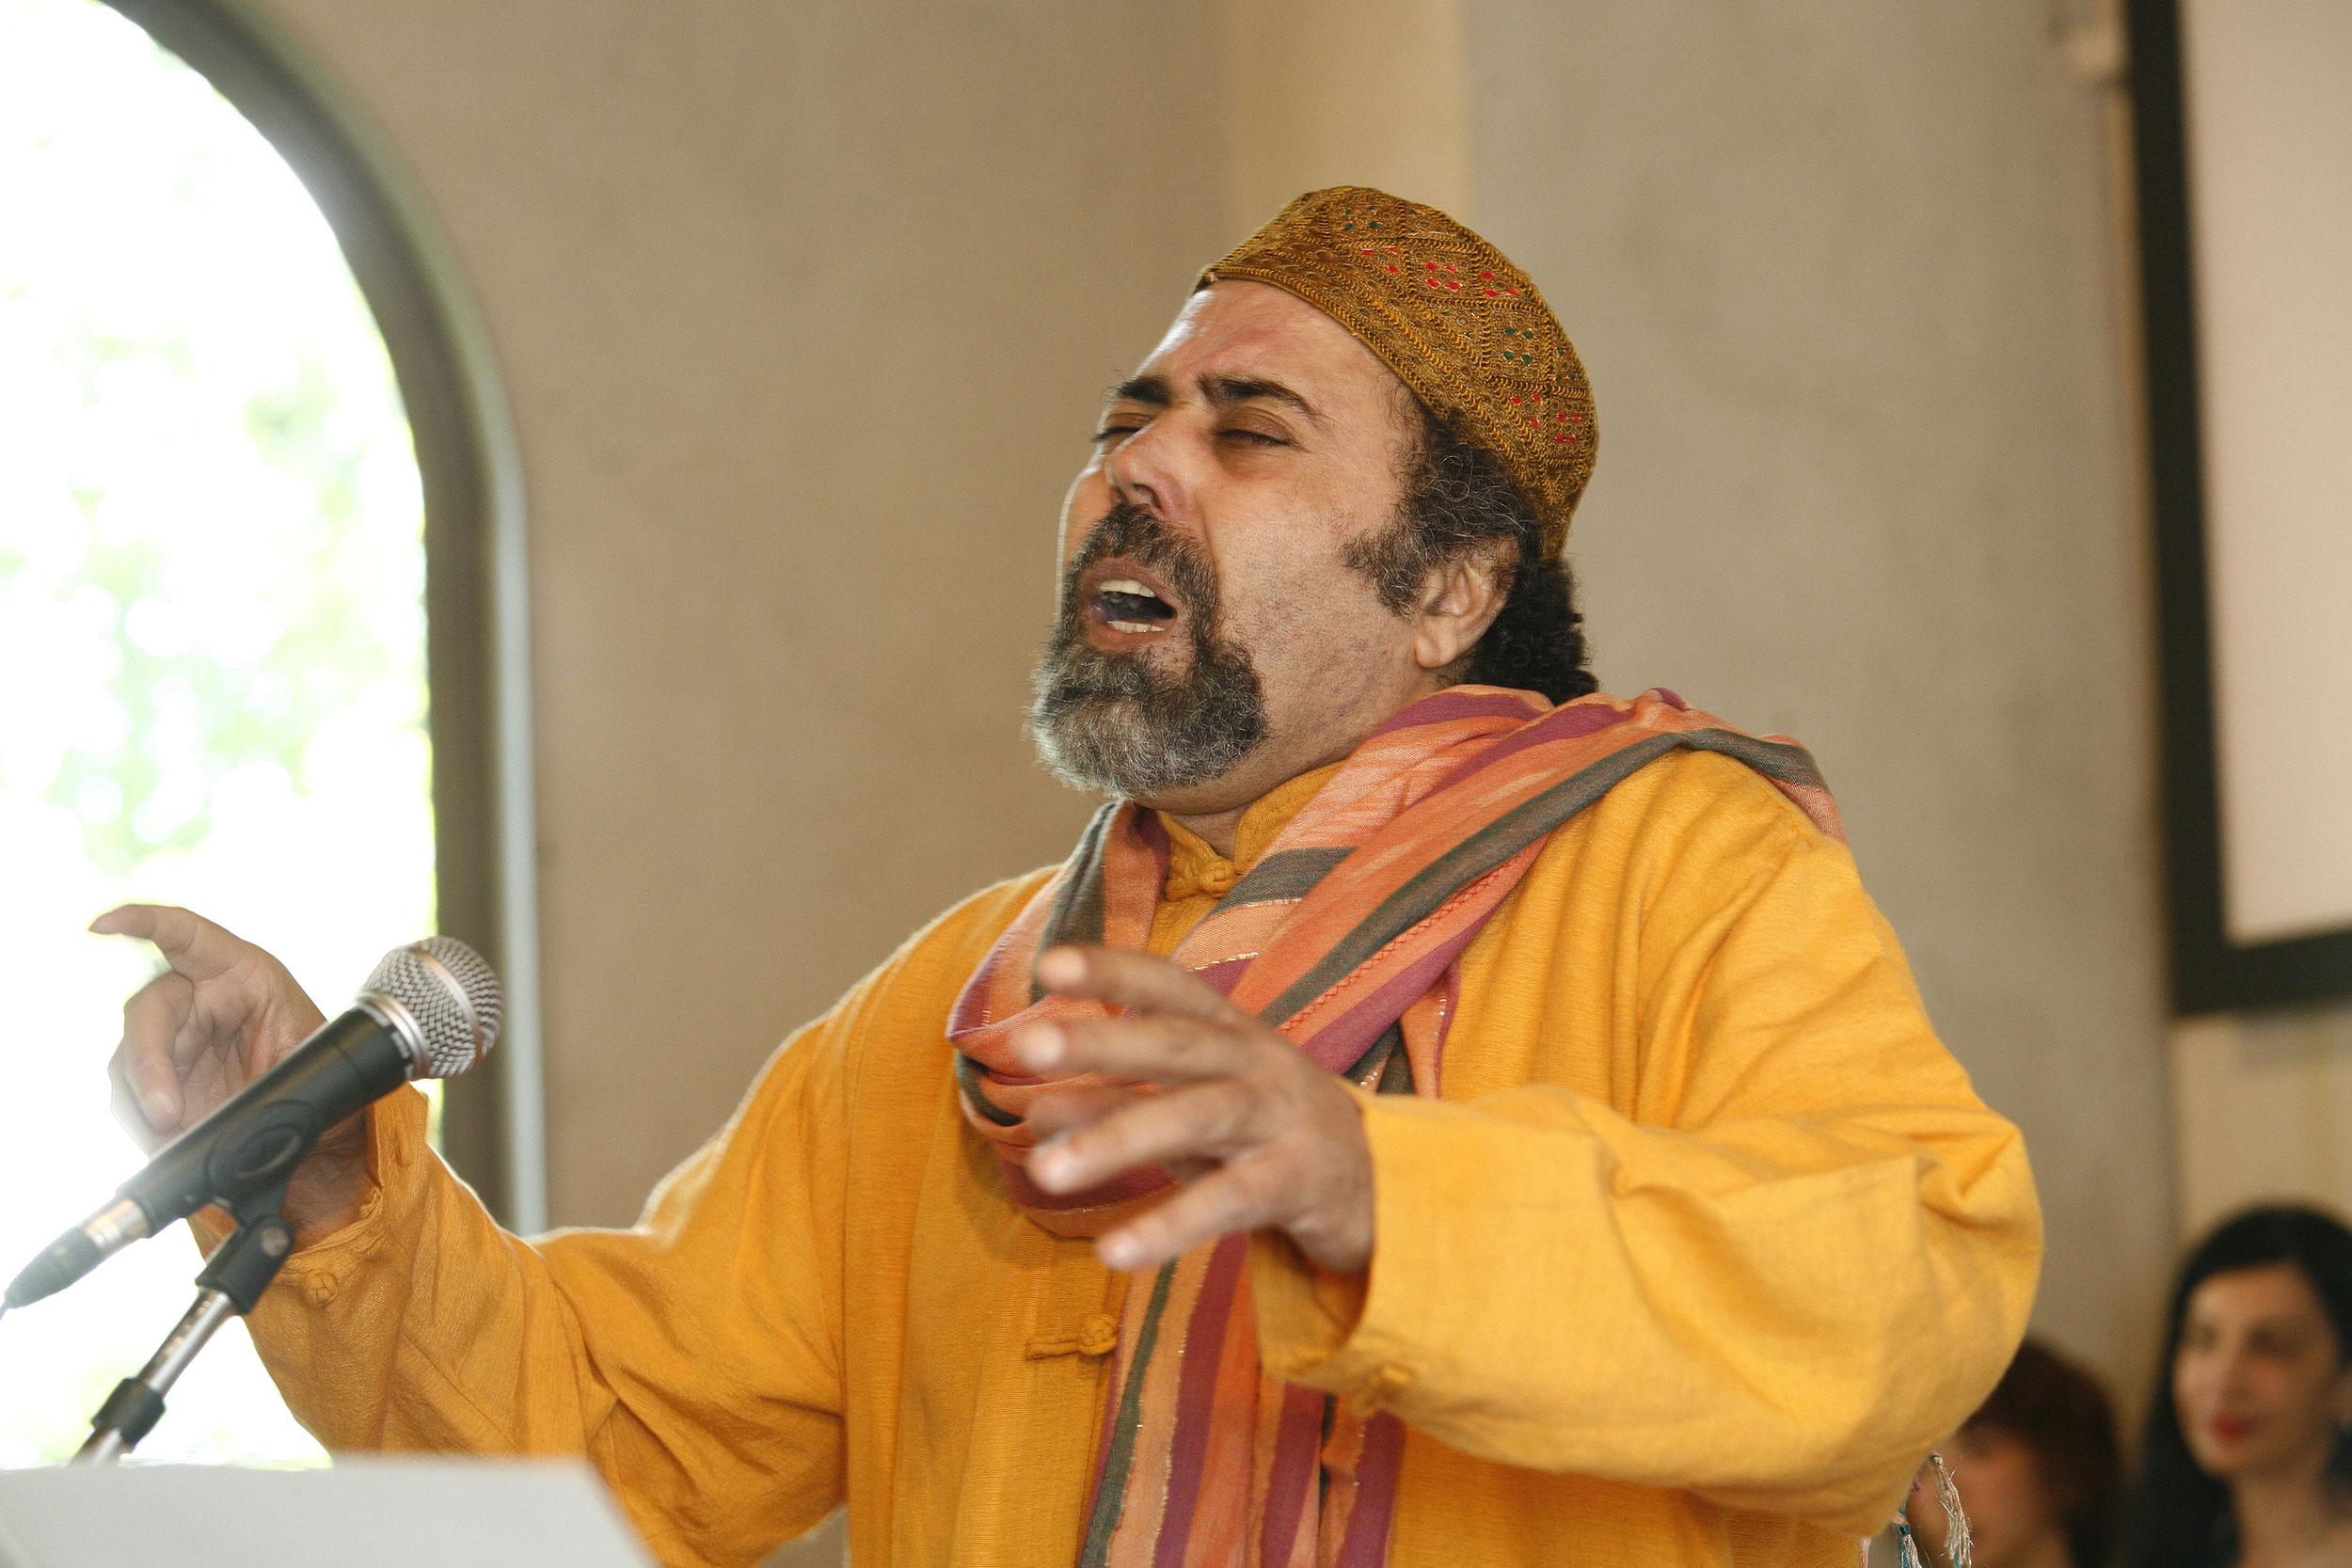 Ahmed Ben Dhiab, Tunisia, Rose Cardinali